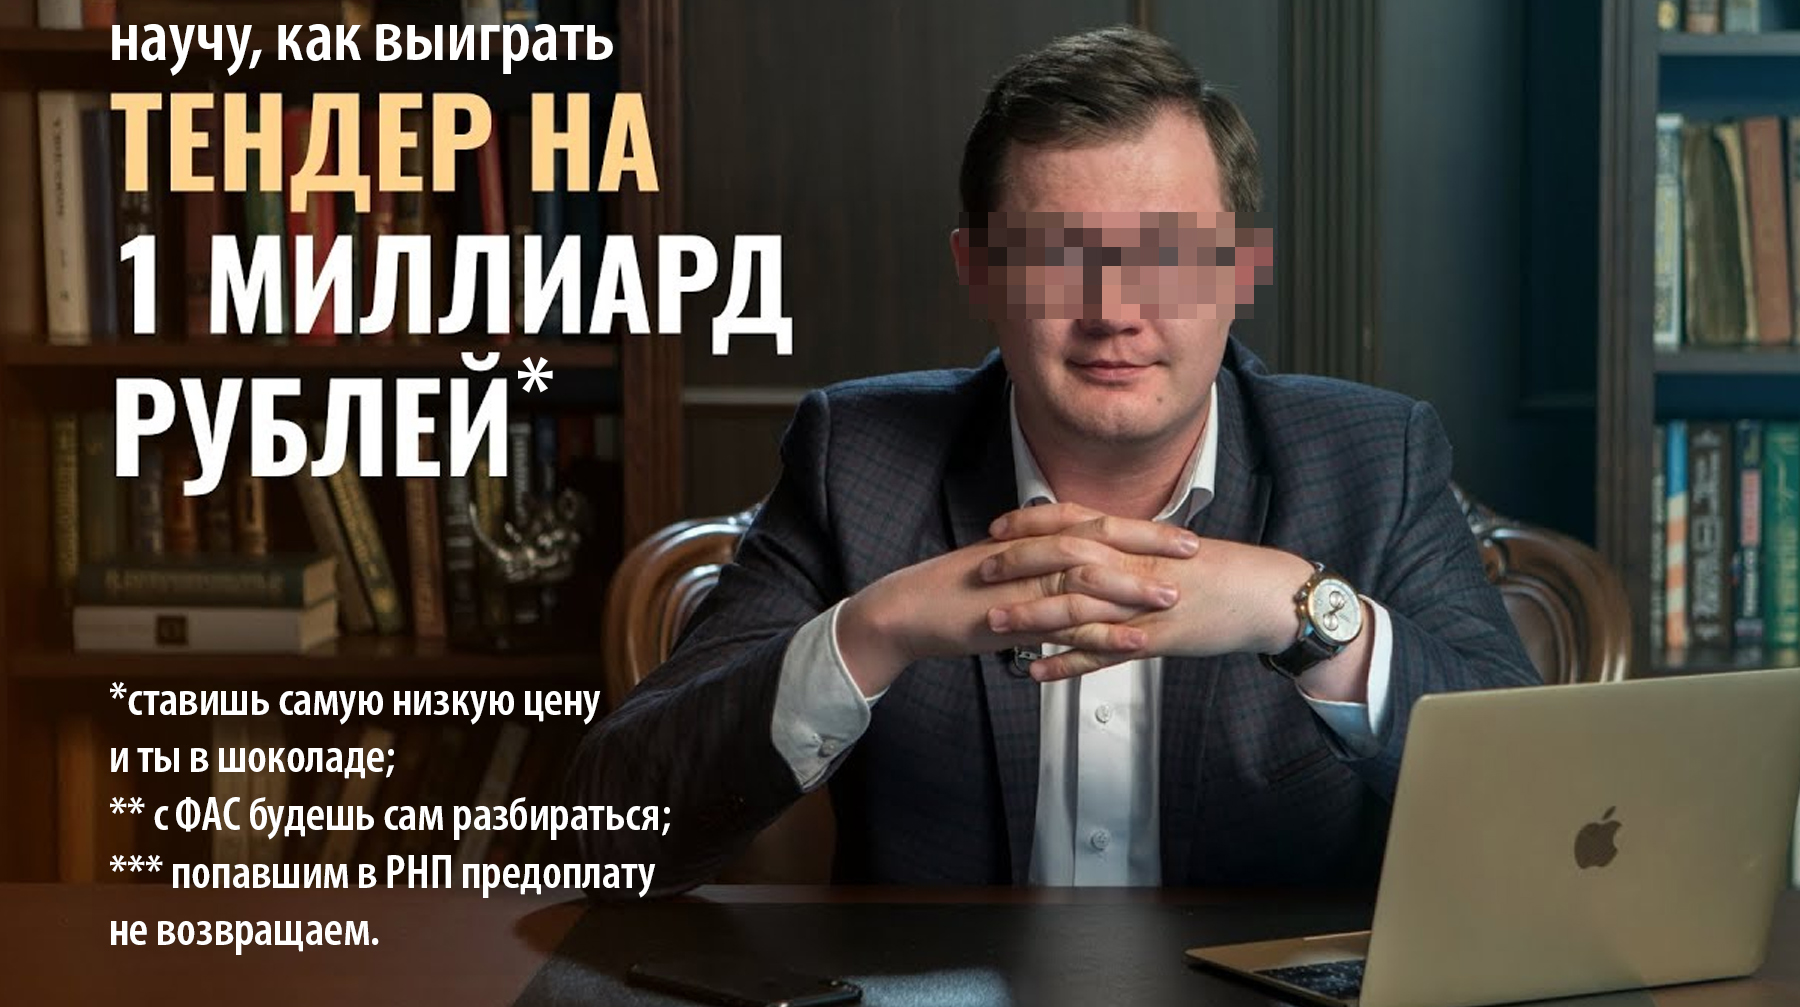 Валерий Овечкин инфоцыган тендер госзакупки